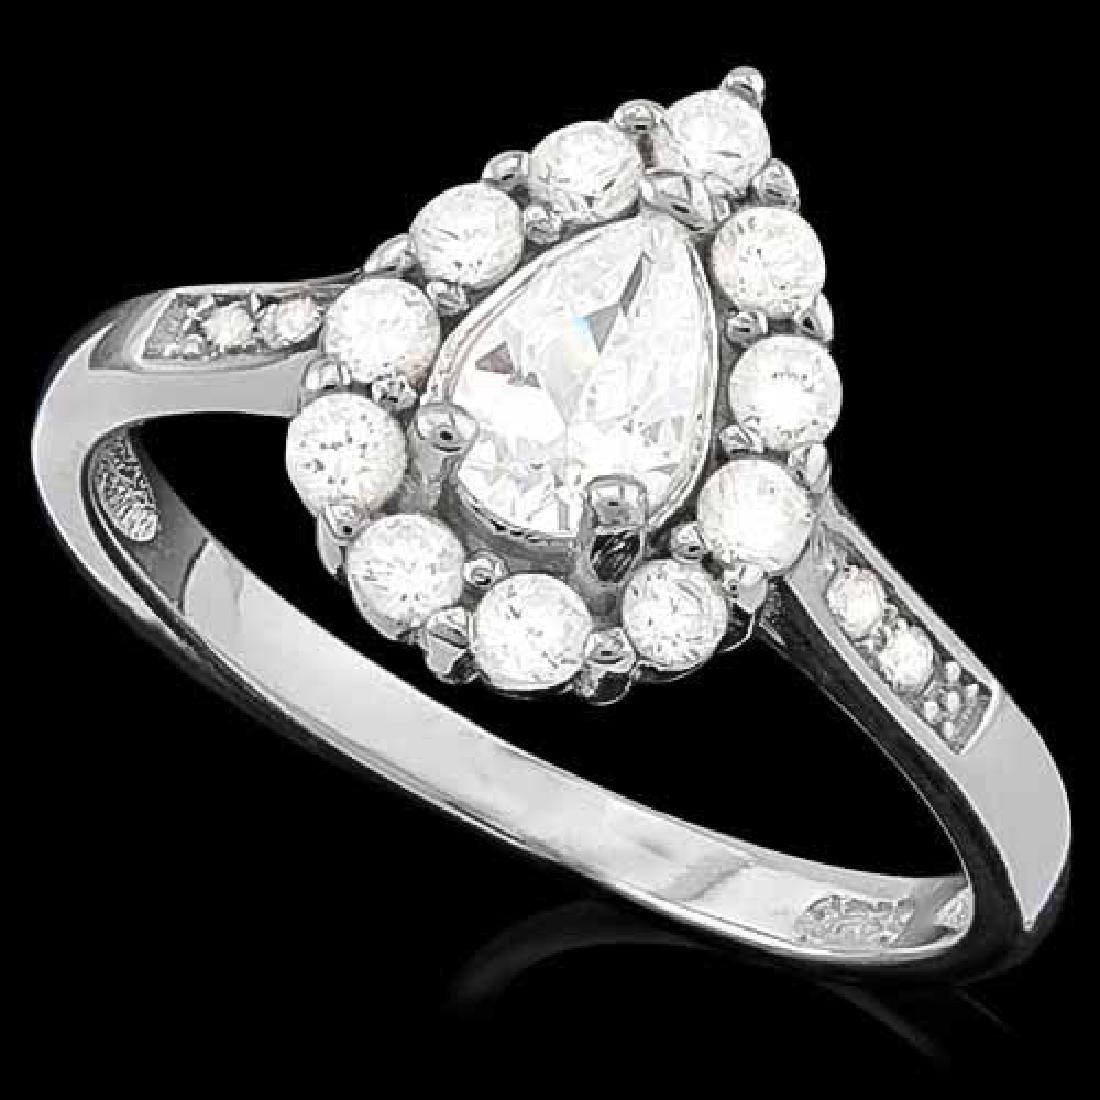 2 CARAT (17 PCS) FLAWLESS CREATED DIAMOND 925 STERLING